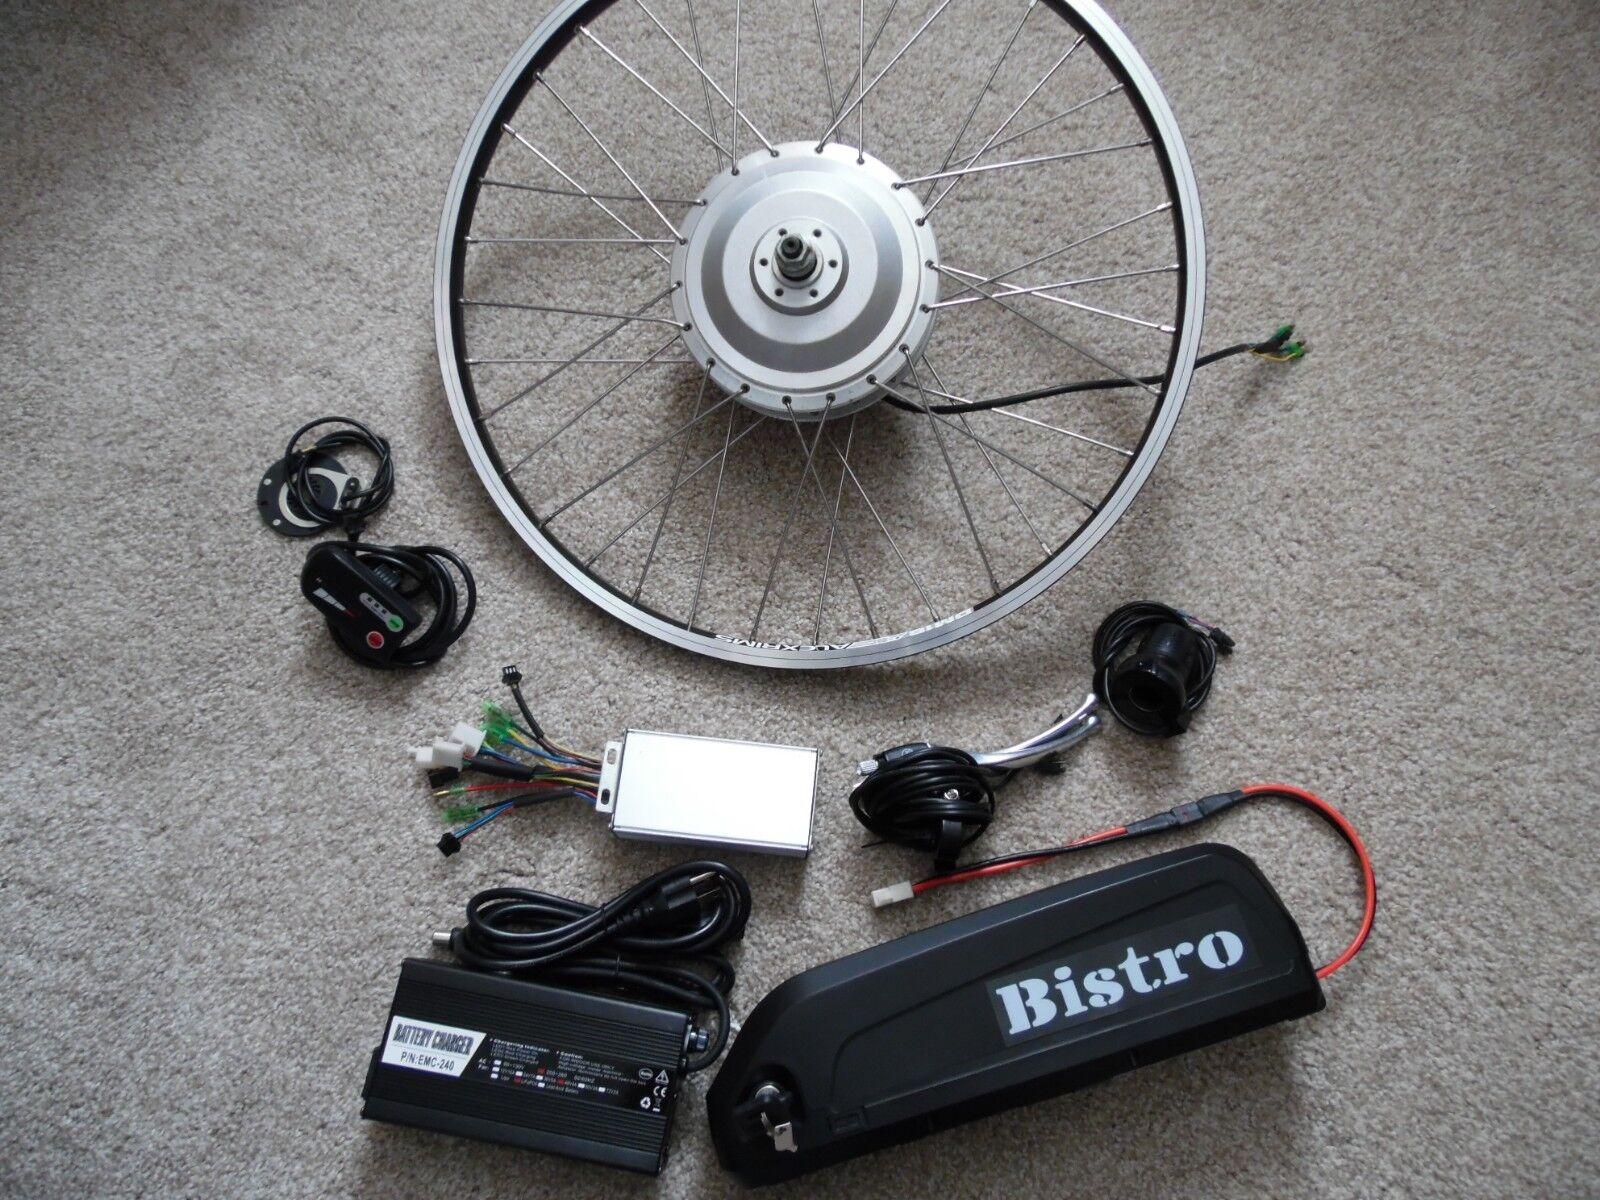 8fun electric bike 24  disc motor 48V 1400W Max hill climber   48v 17ah battery